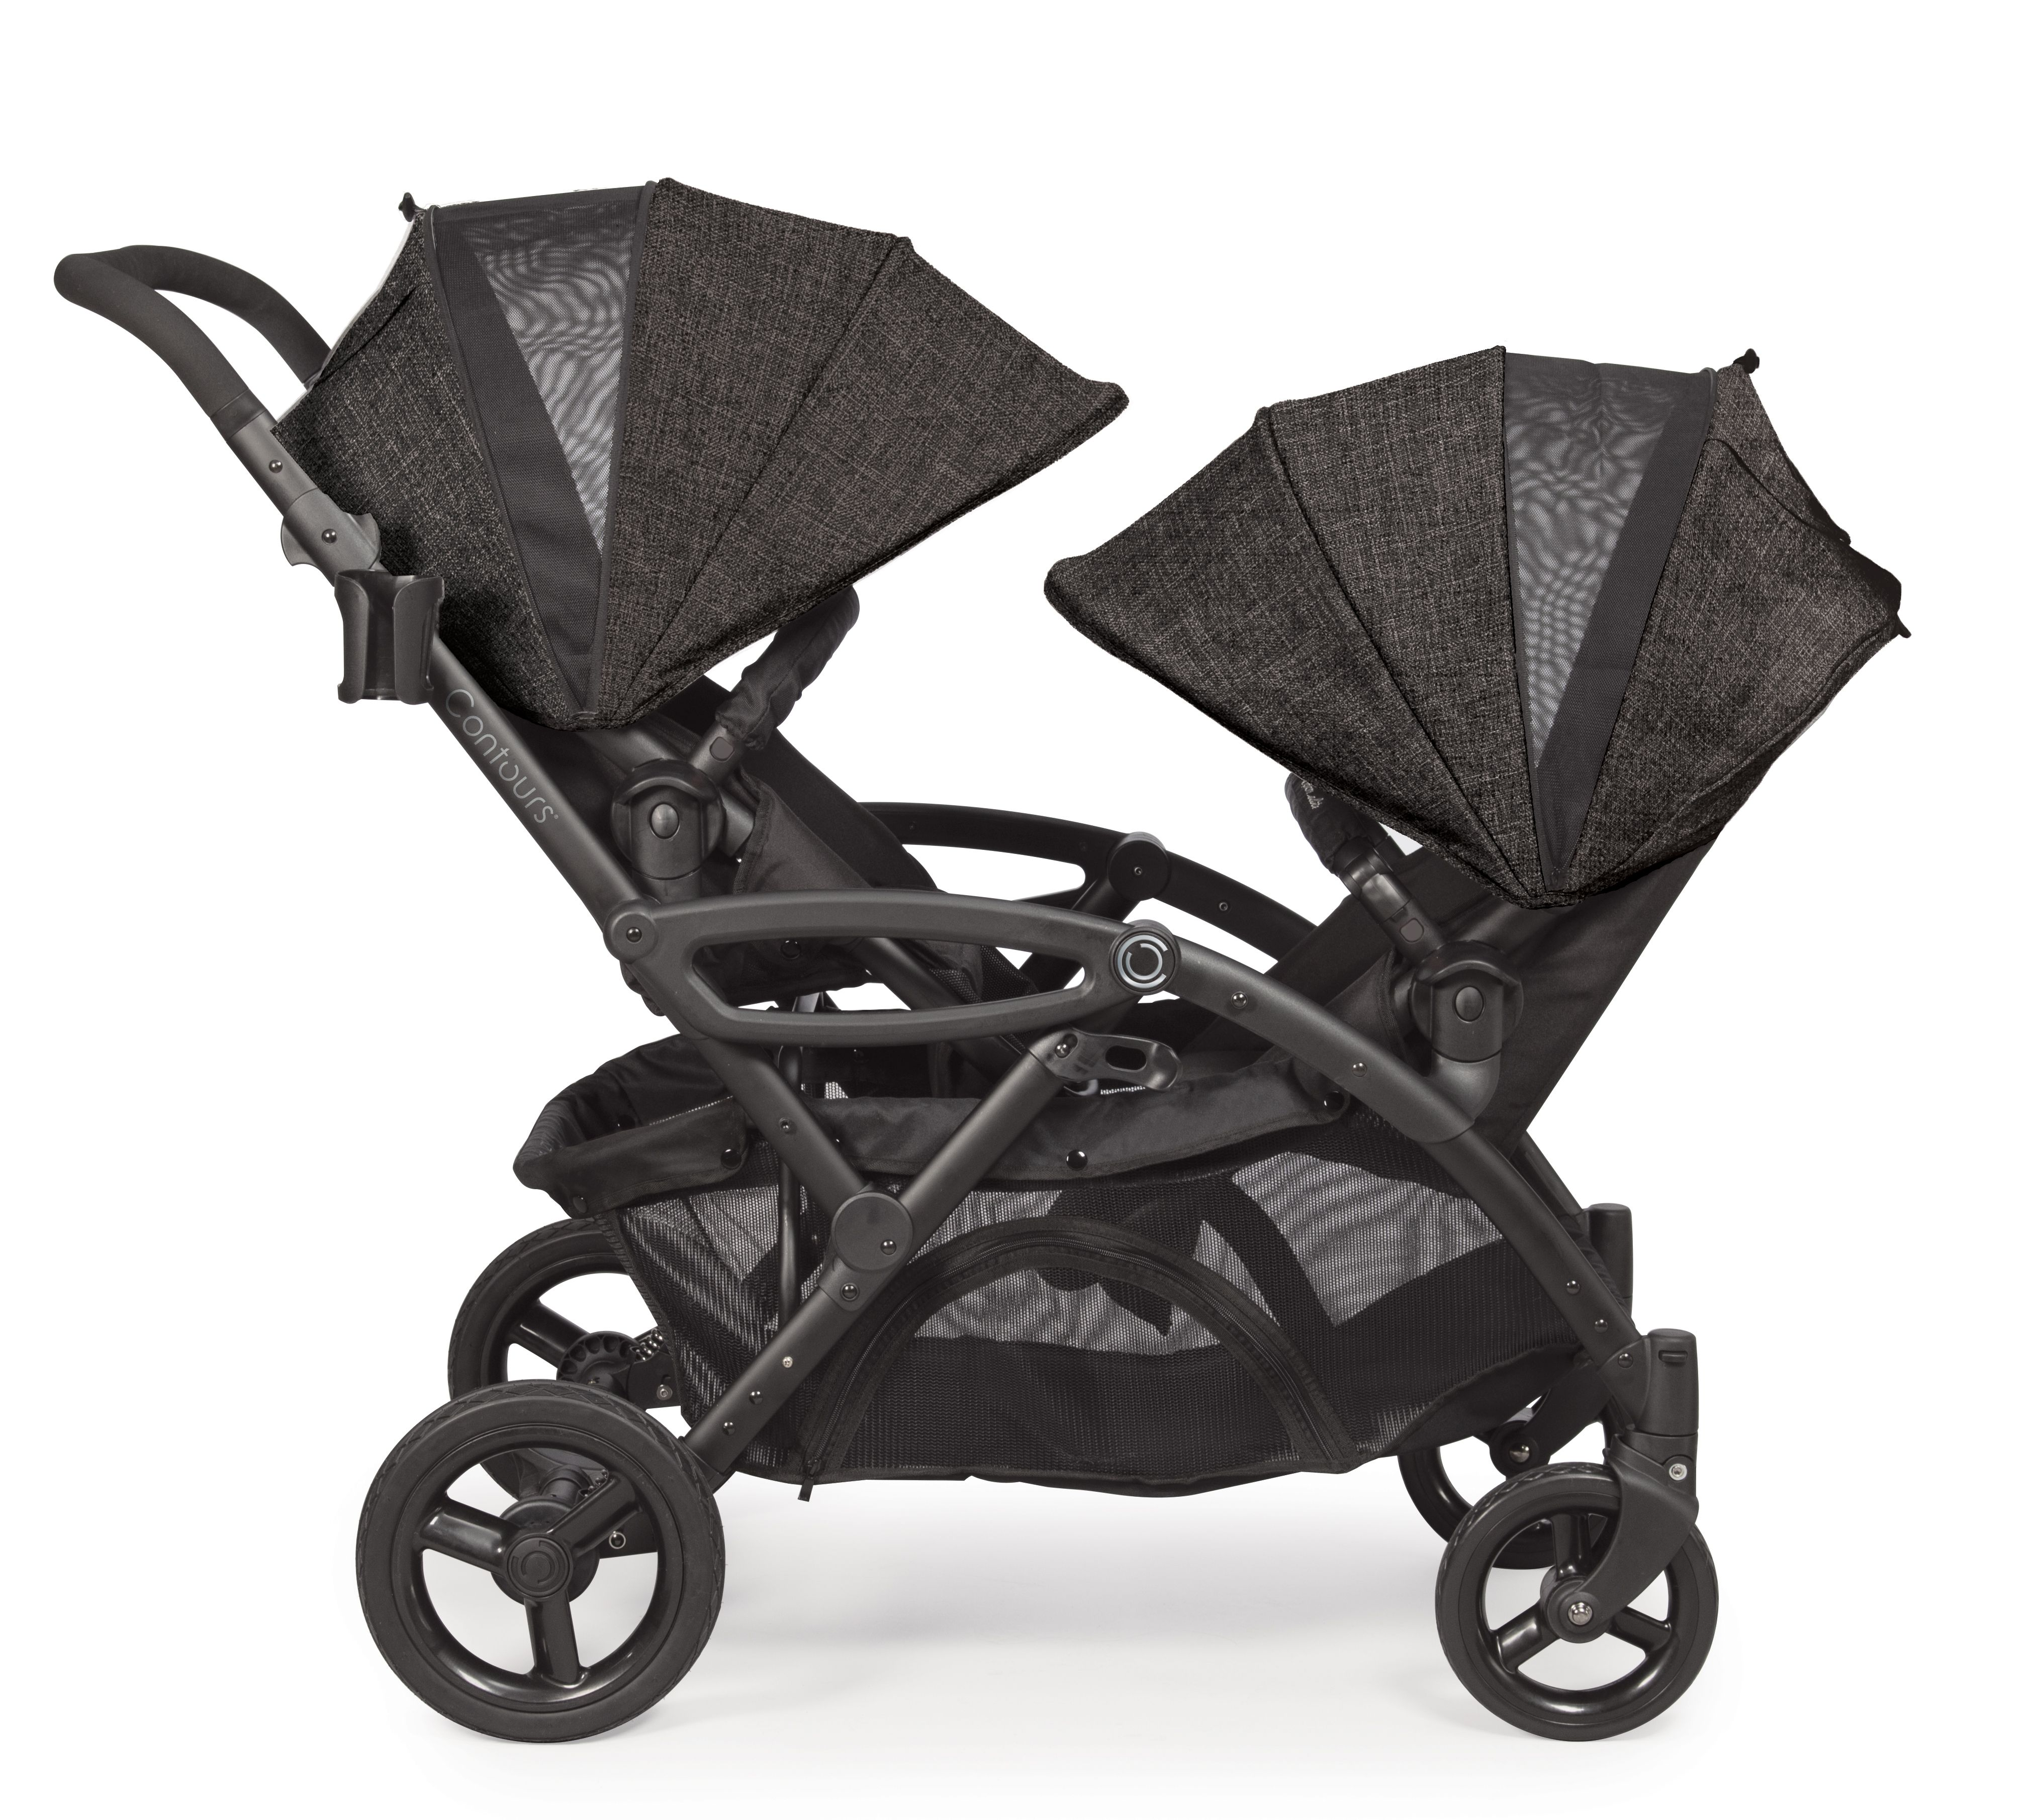 49++ Contours stroller shopping basket ideas in 2021